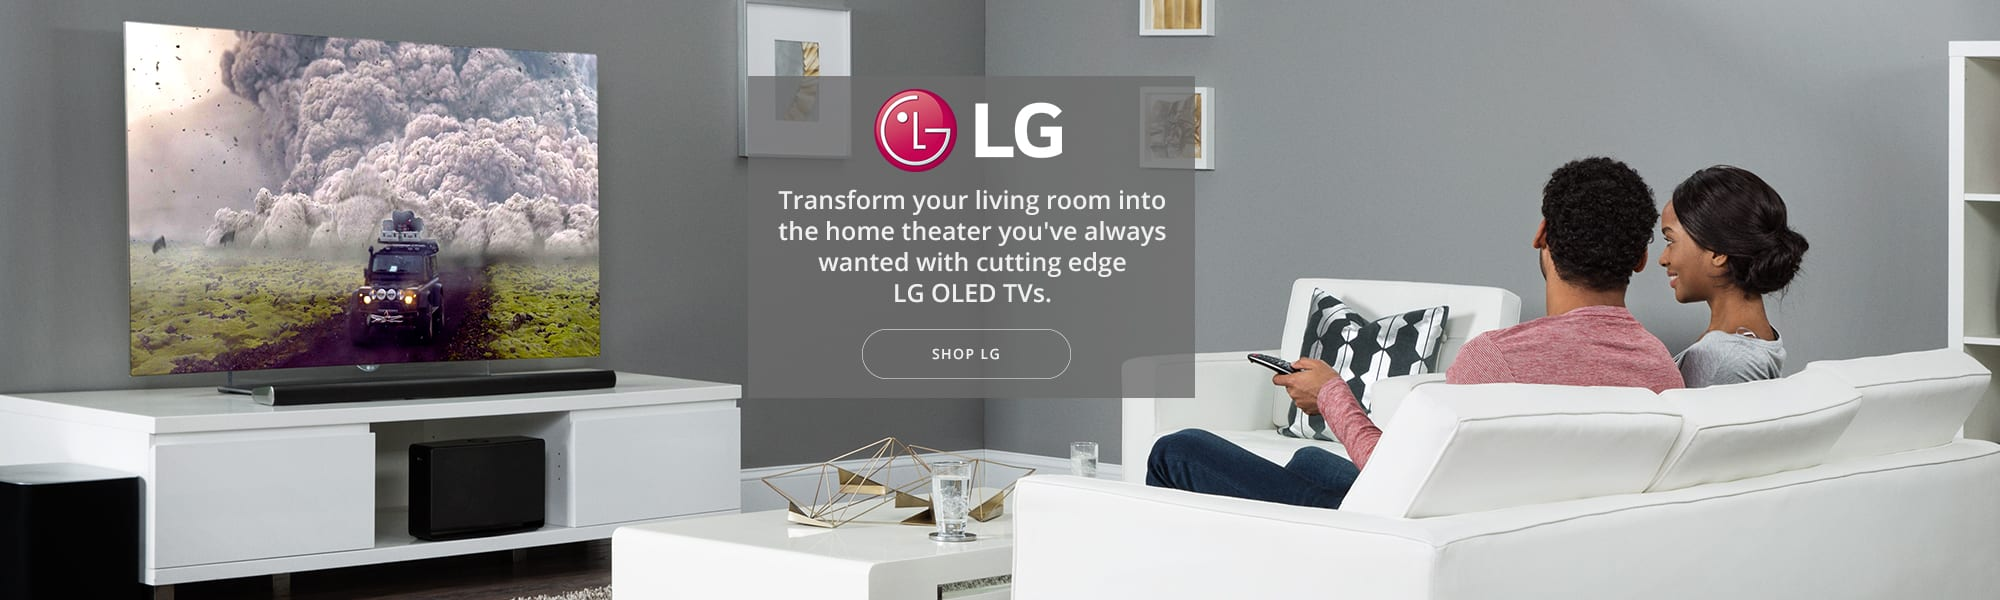 LG TV banner